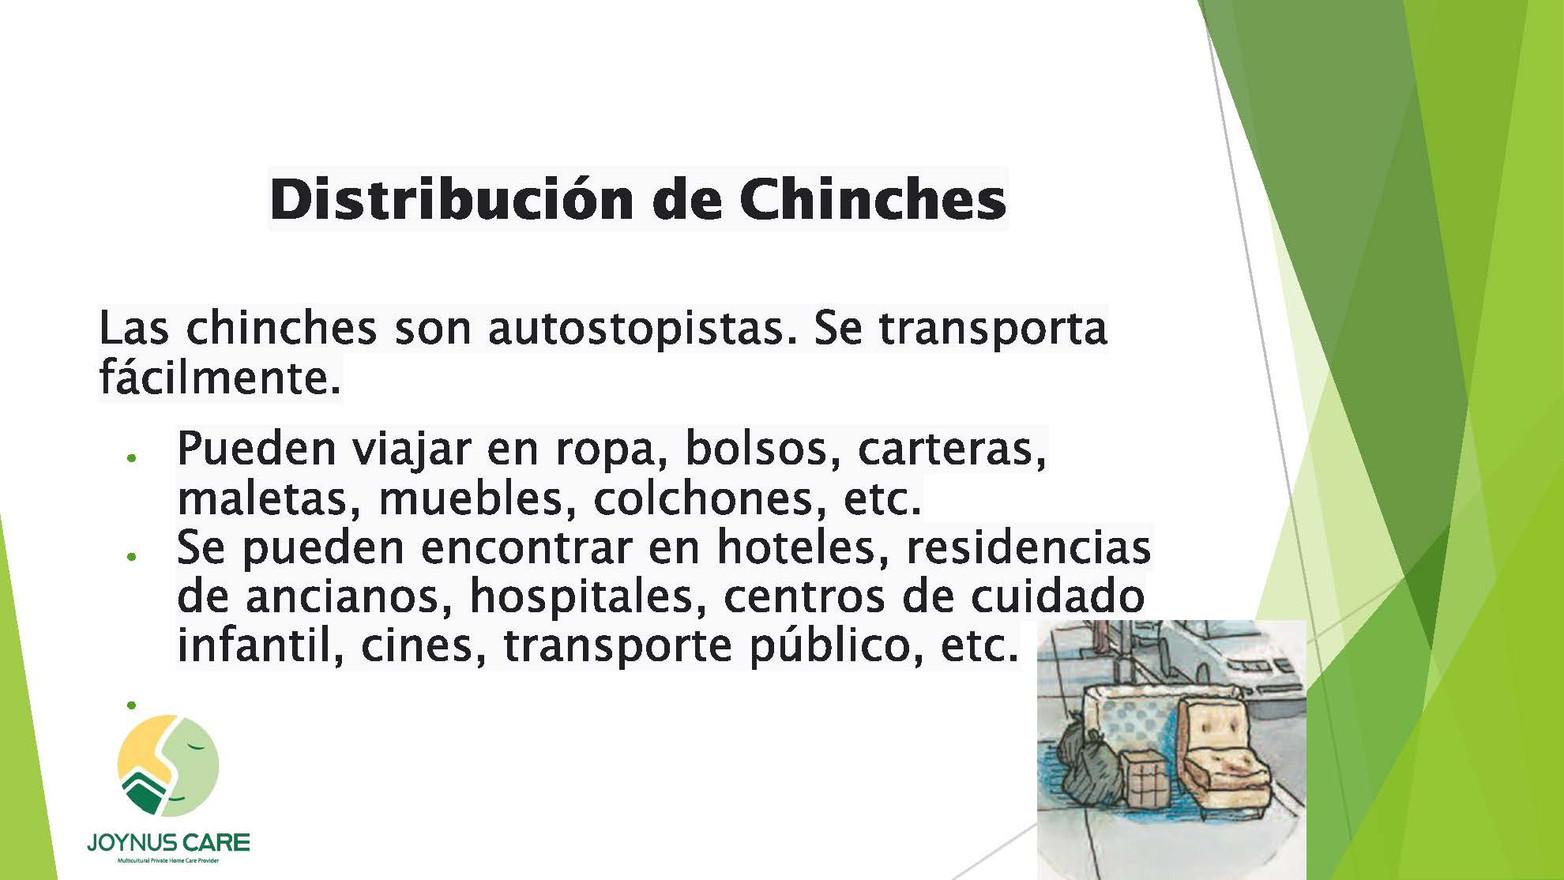 Chinches Alerta_07.jpg